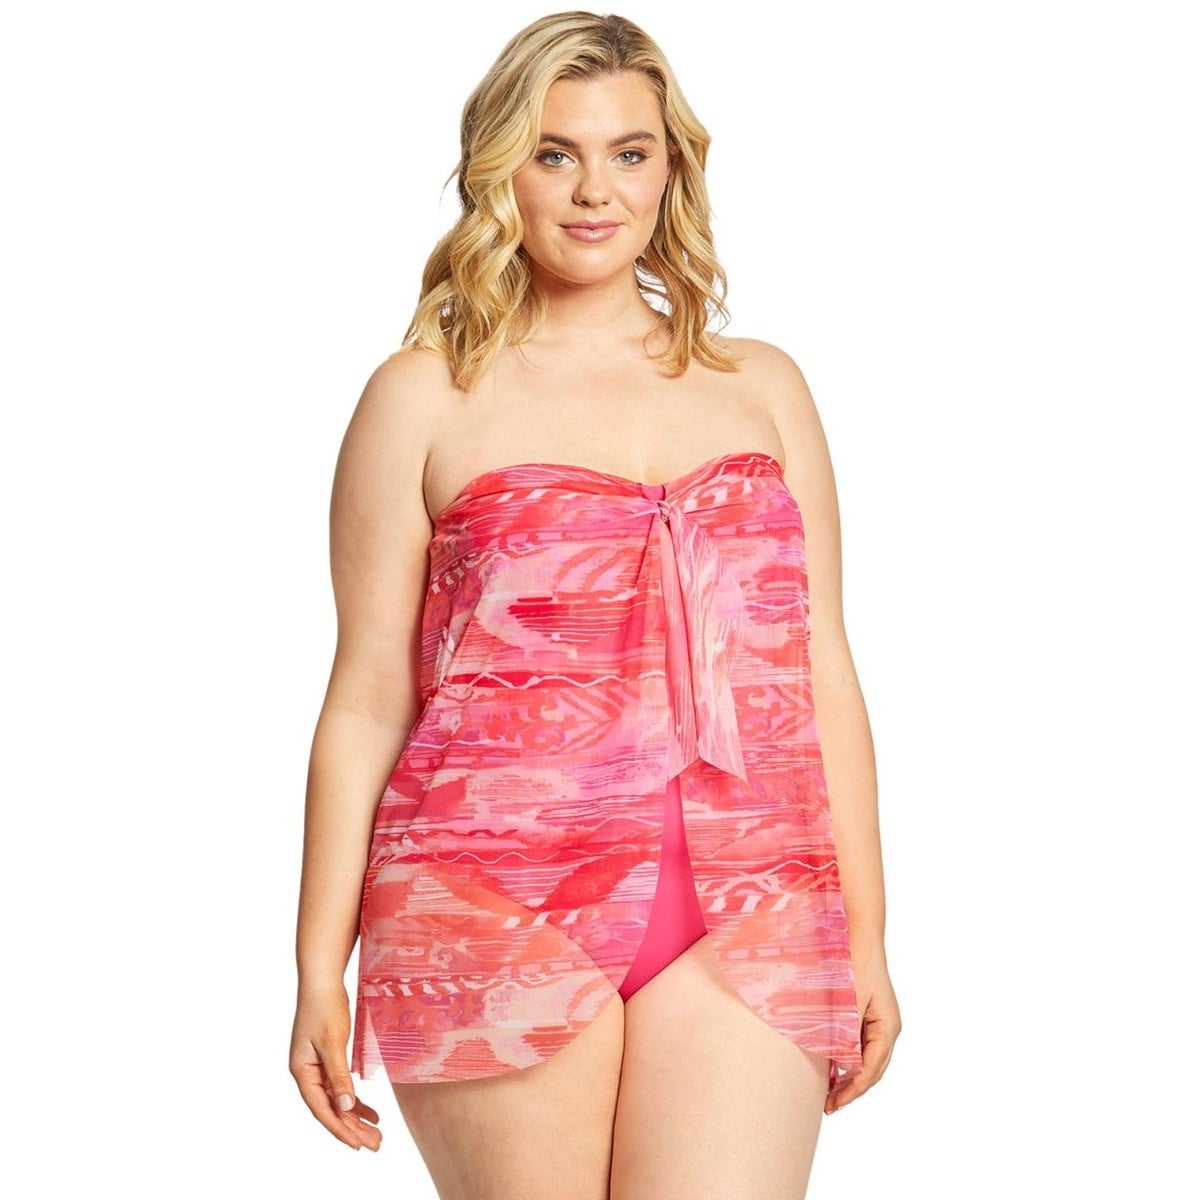 e24bc88451 Ralph Lauren Swimwear | Find Great Women's Clothing Deals Shopping at  Overstock